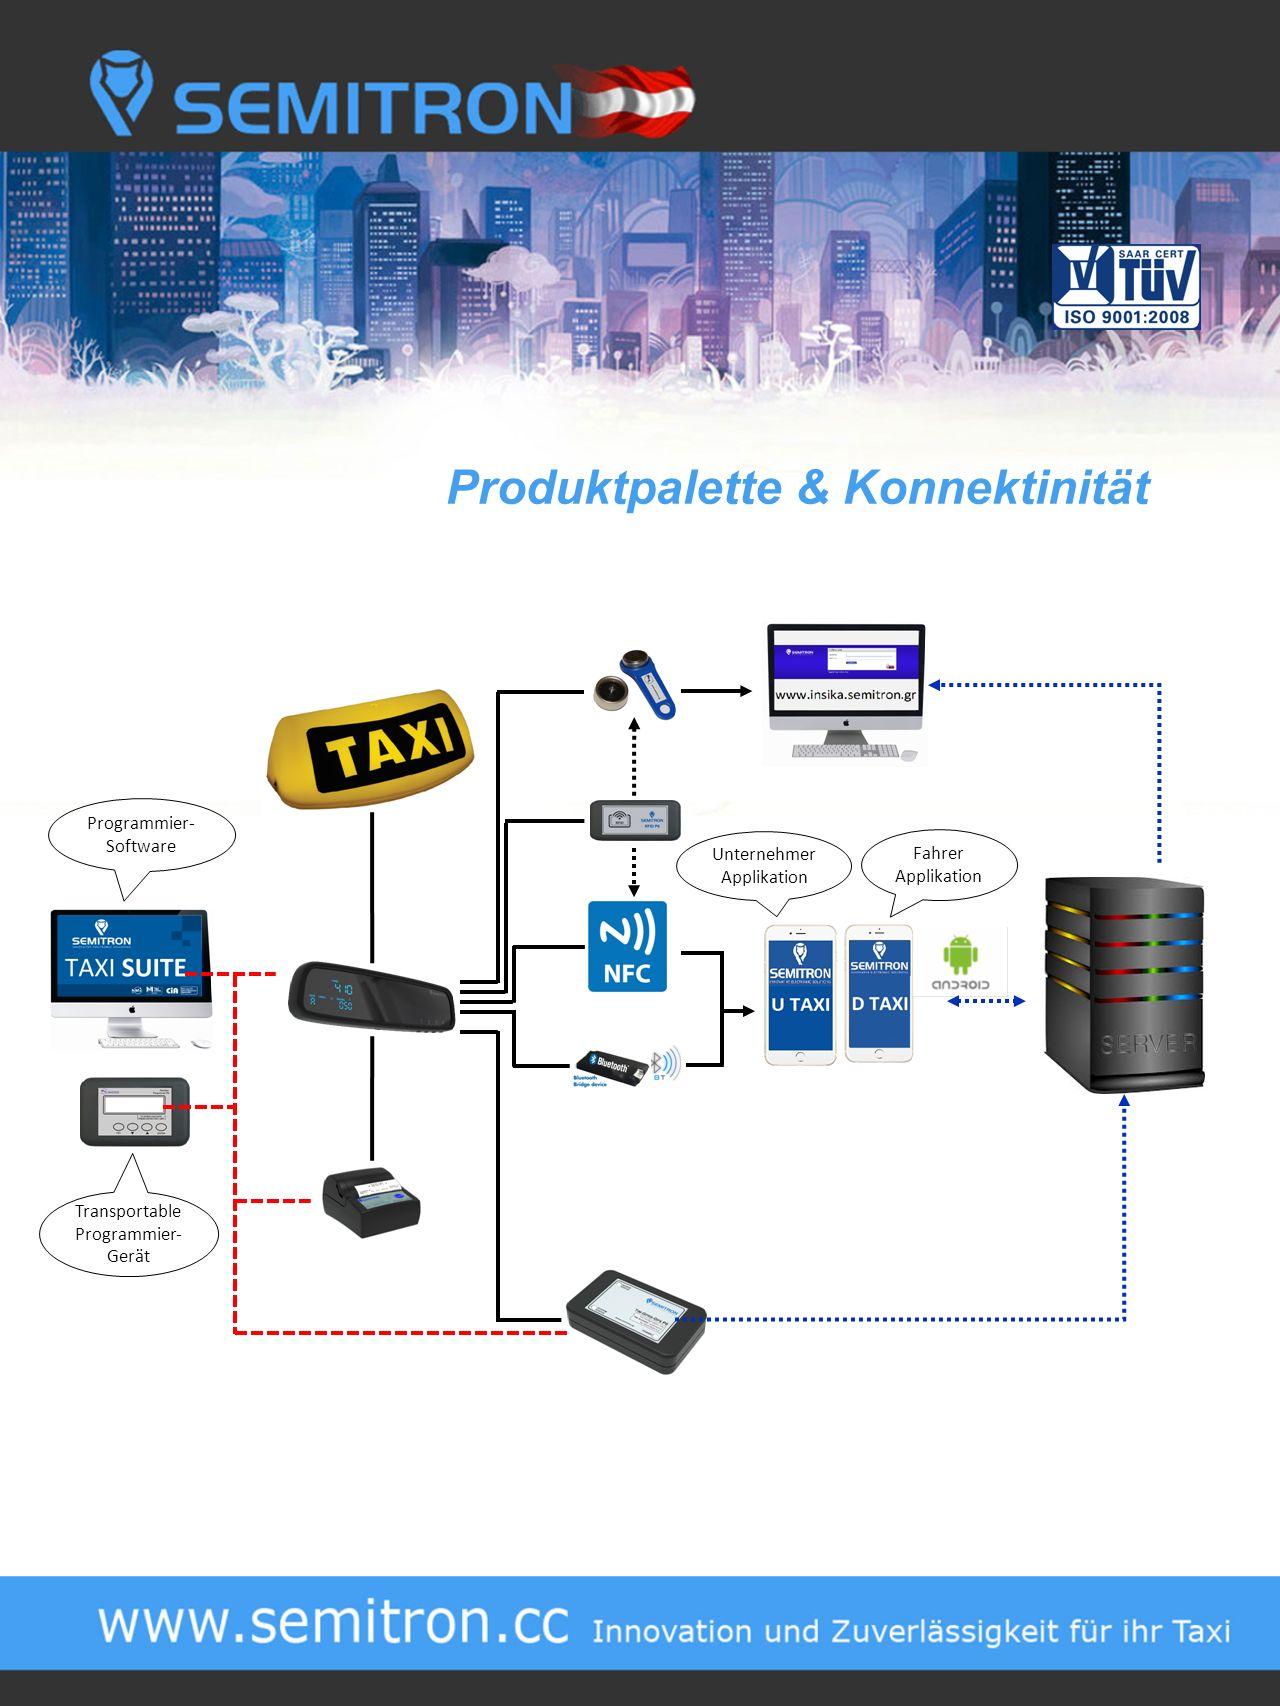 Produktpalette & Konnektinität